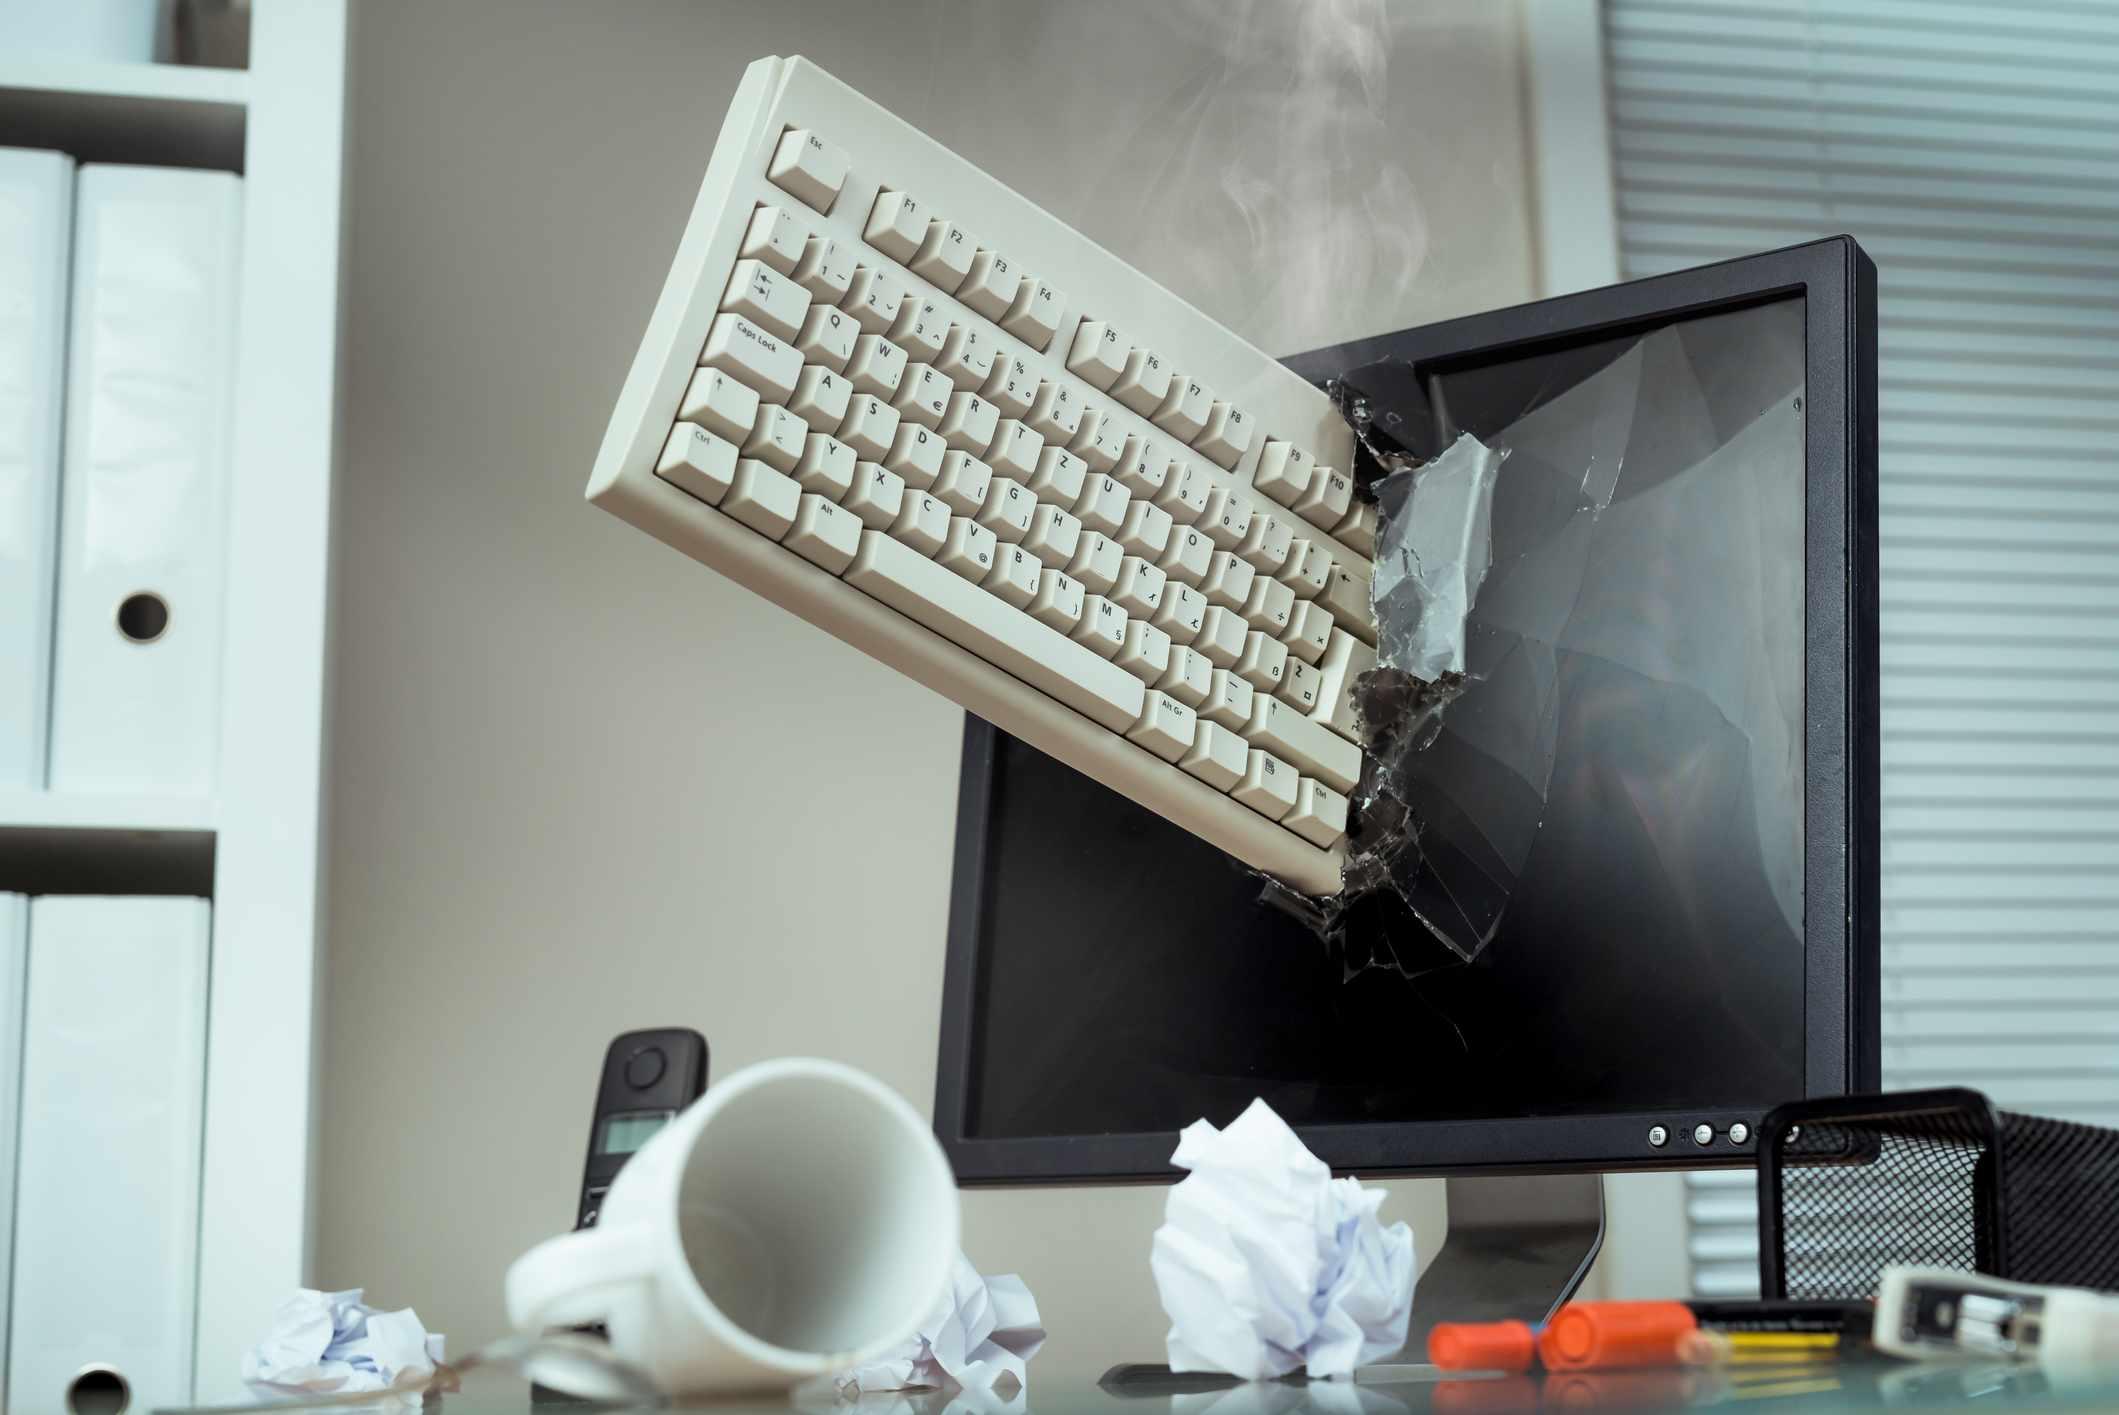 A keyboard smashed through a computer LCD monitor